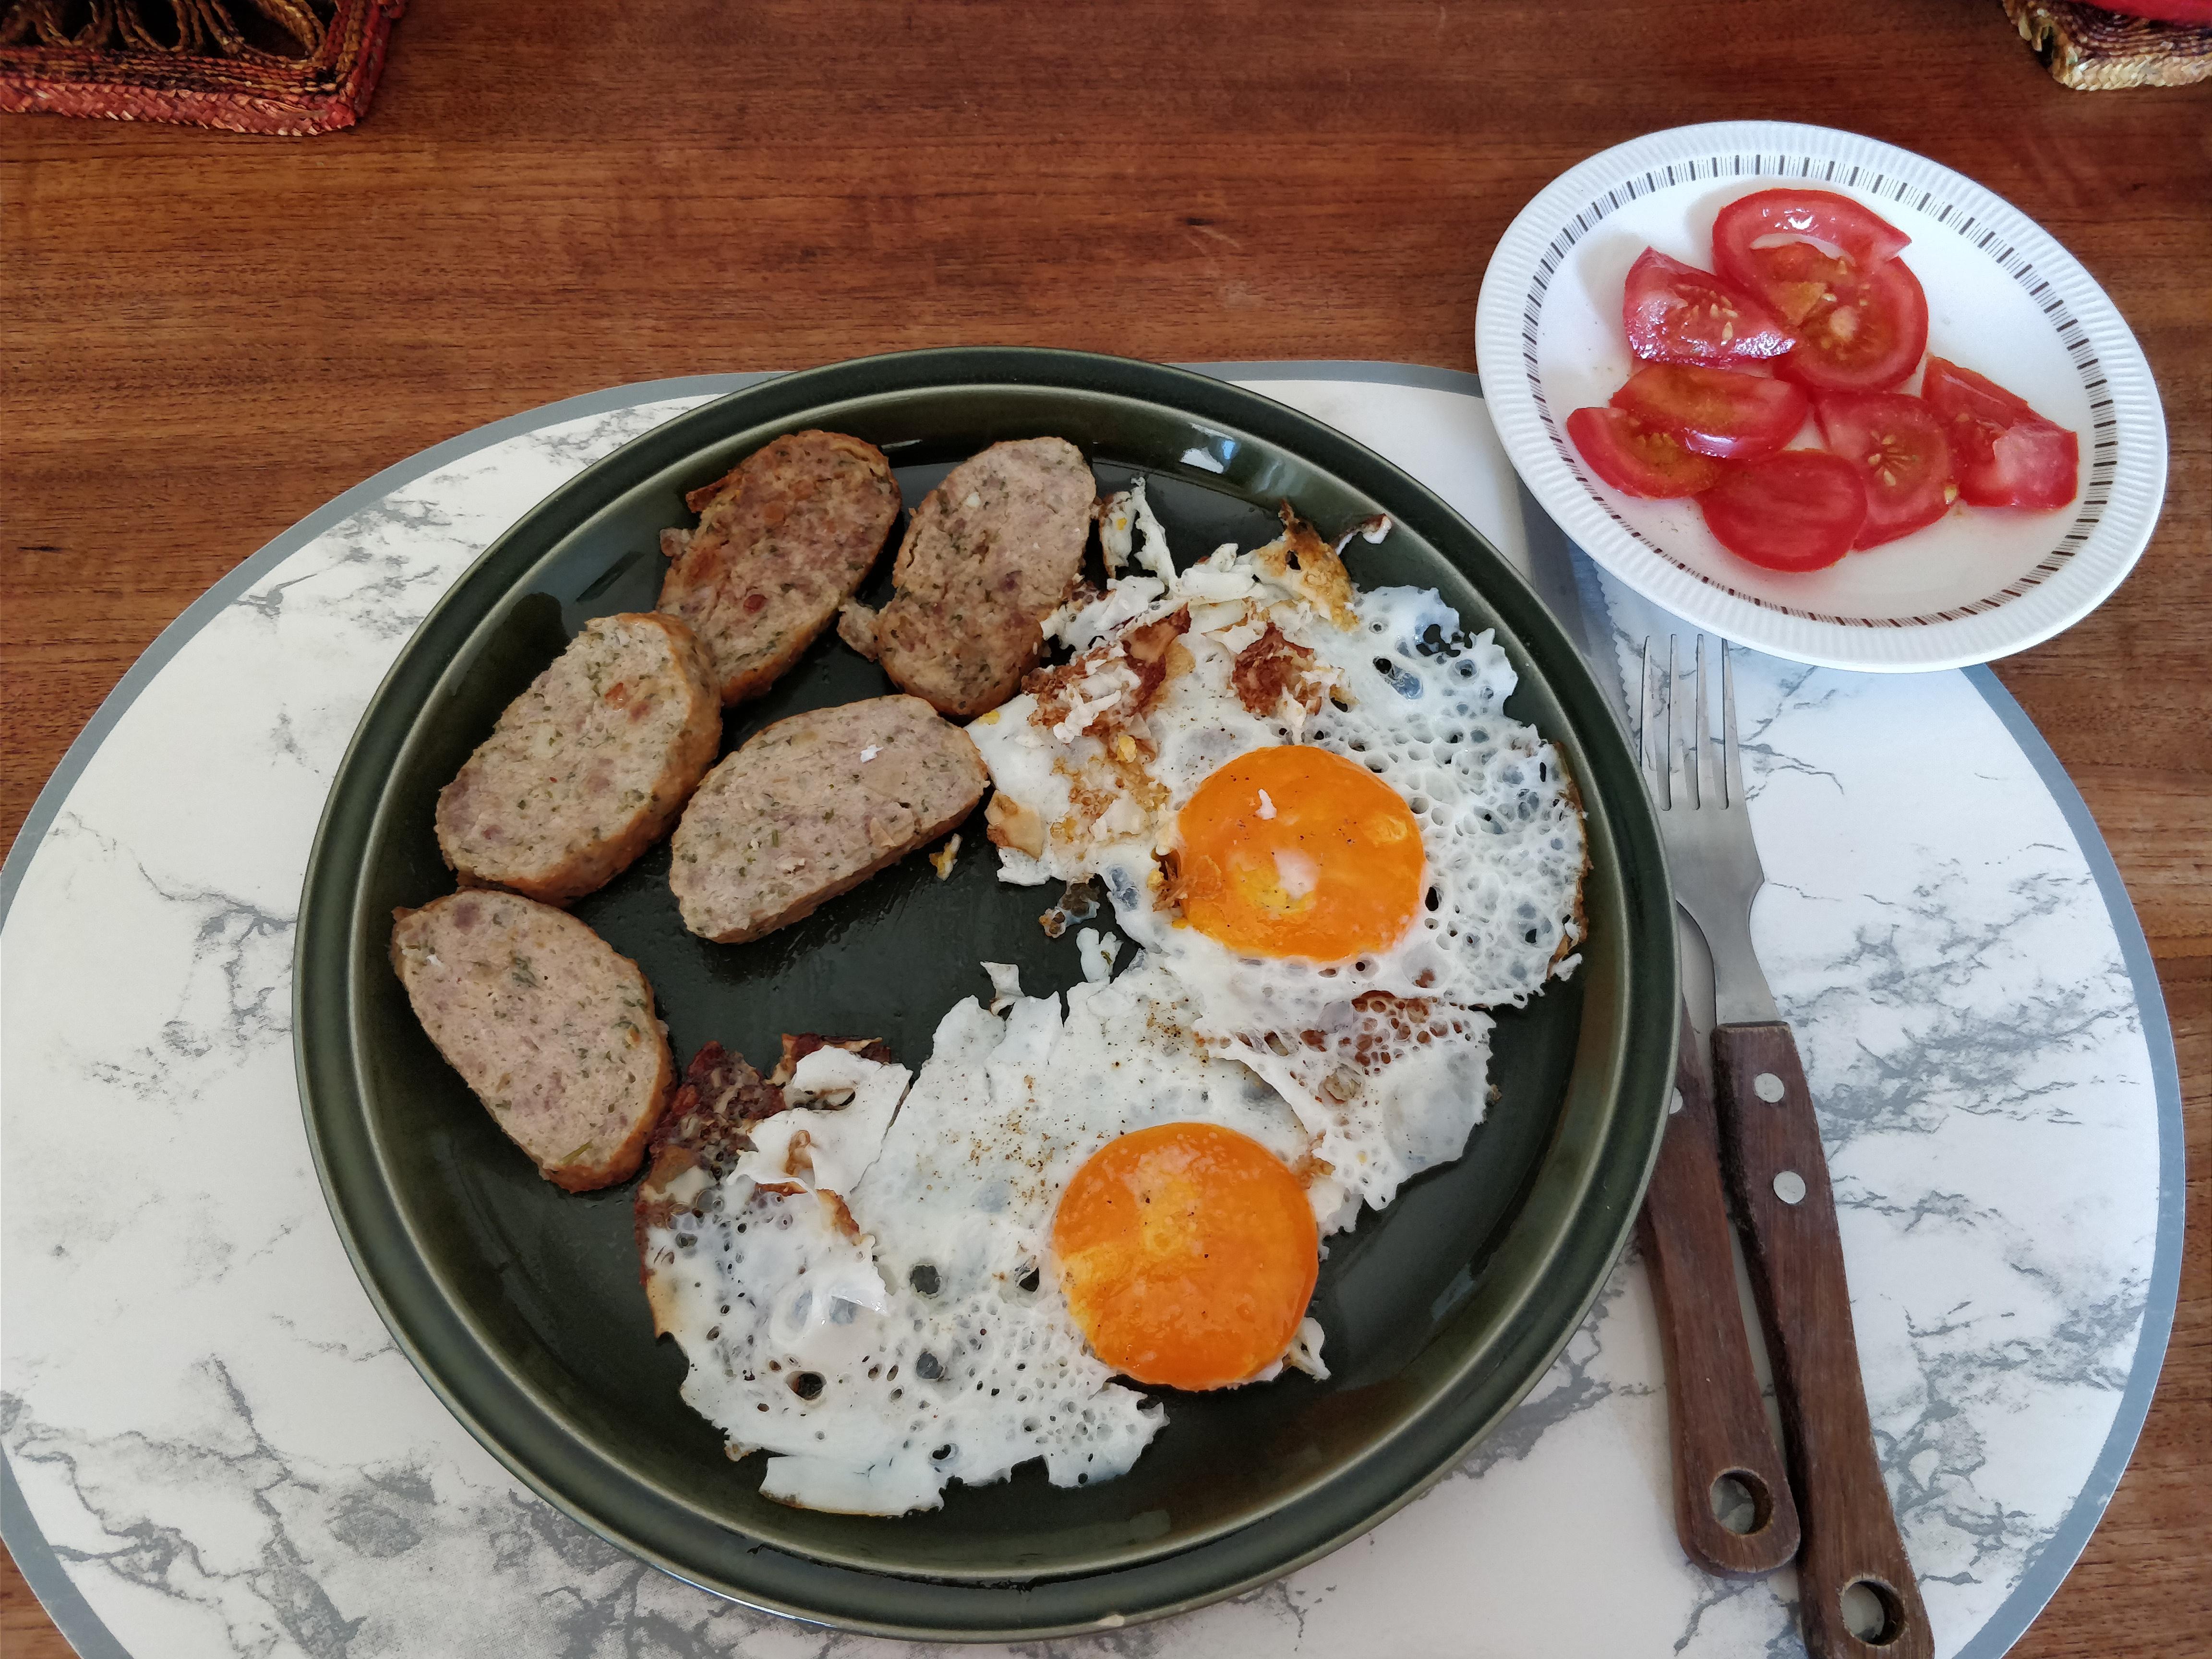 http://foodloader.net/nico_2017-08-07_spiegeleier-fleischkuechle-tomaten.jpg